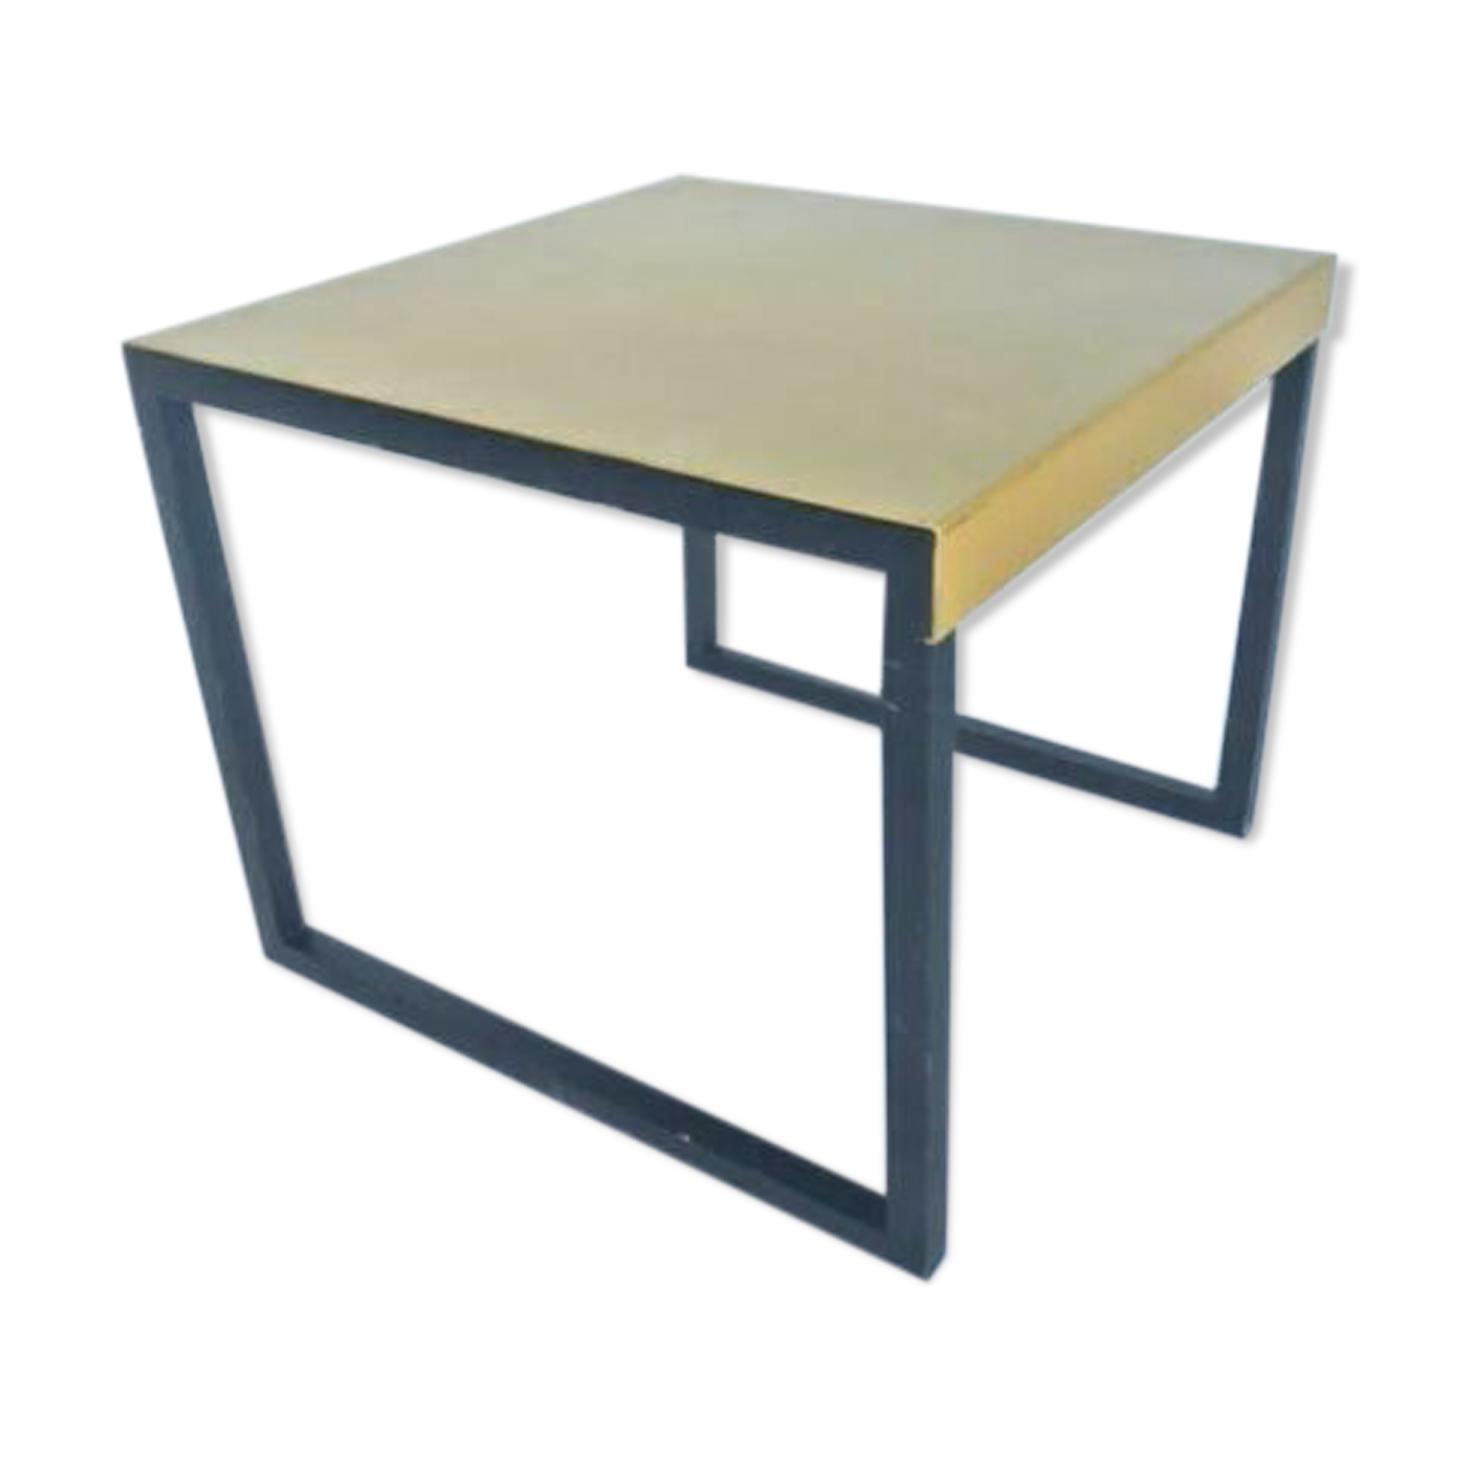 Table Habitat 1980 n 1709 metal noir dessus jaune